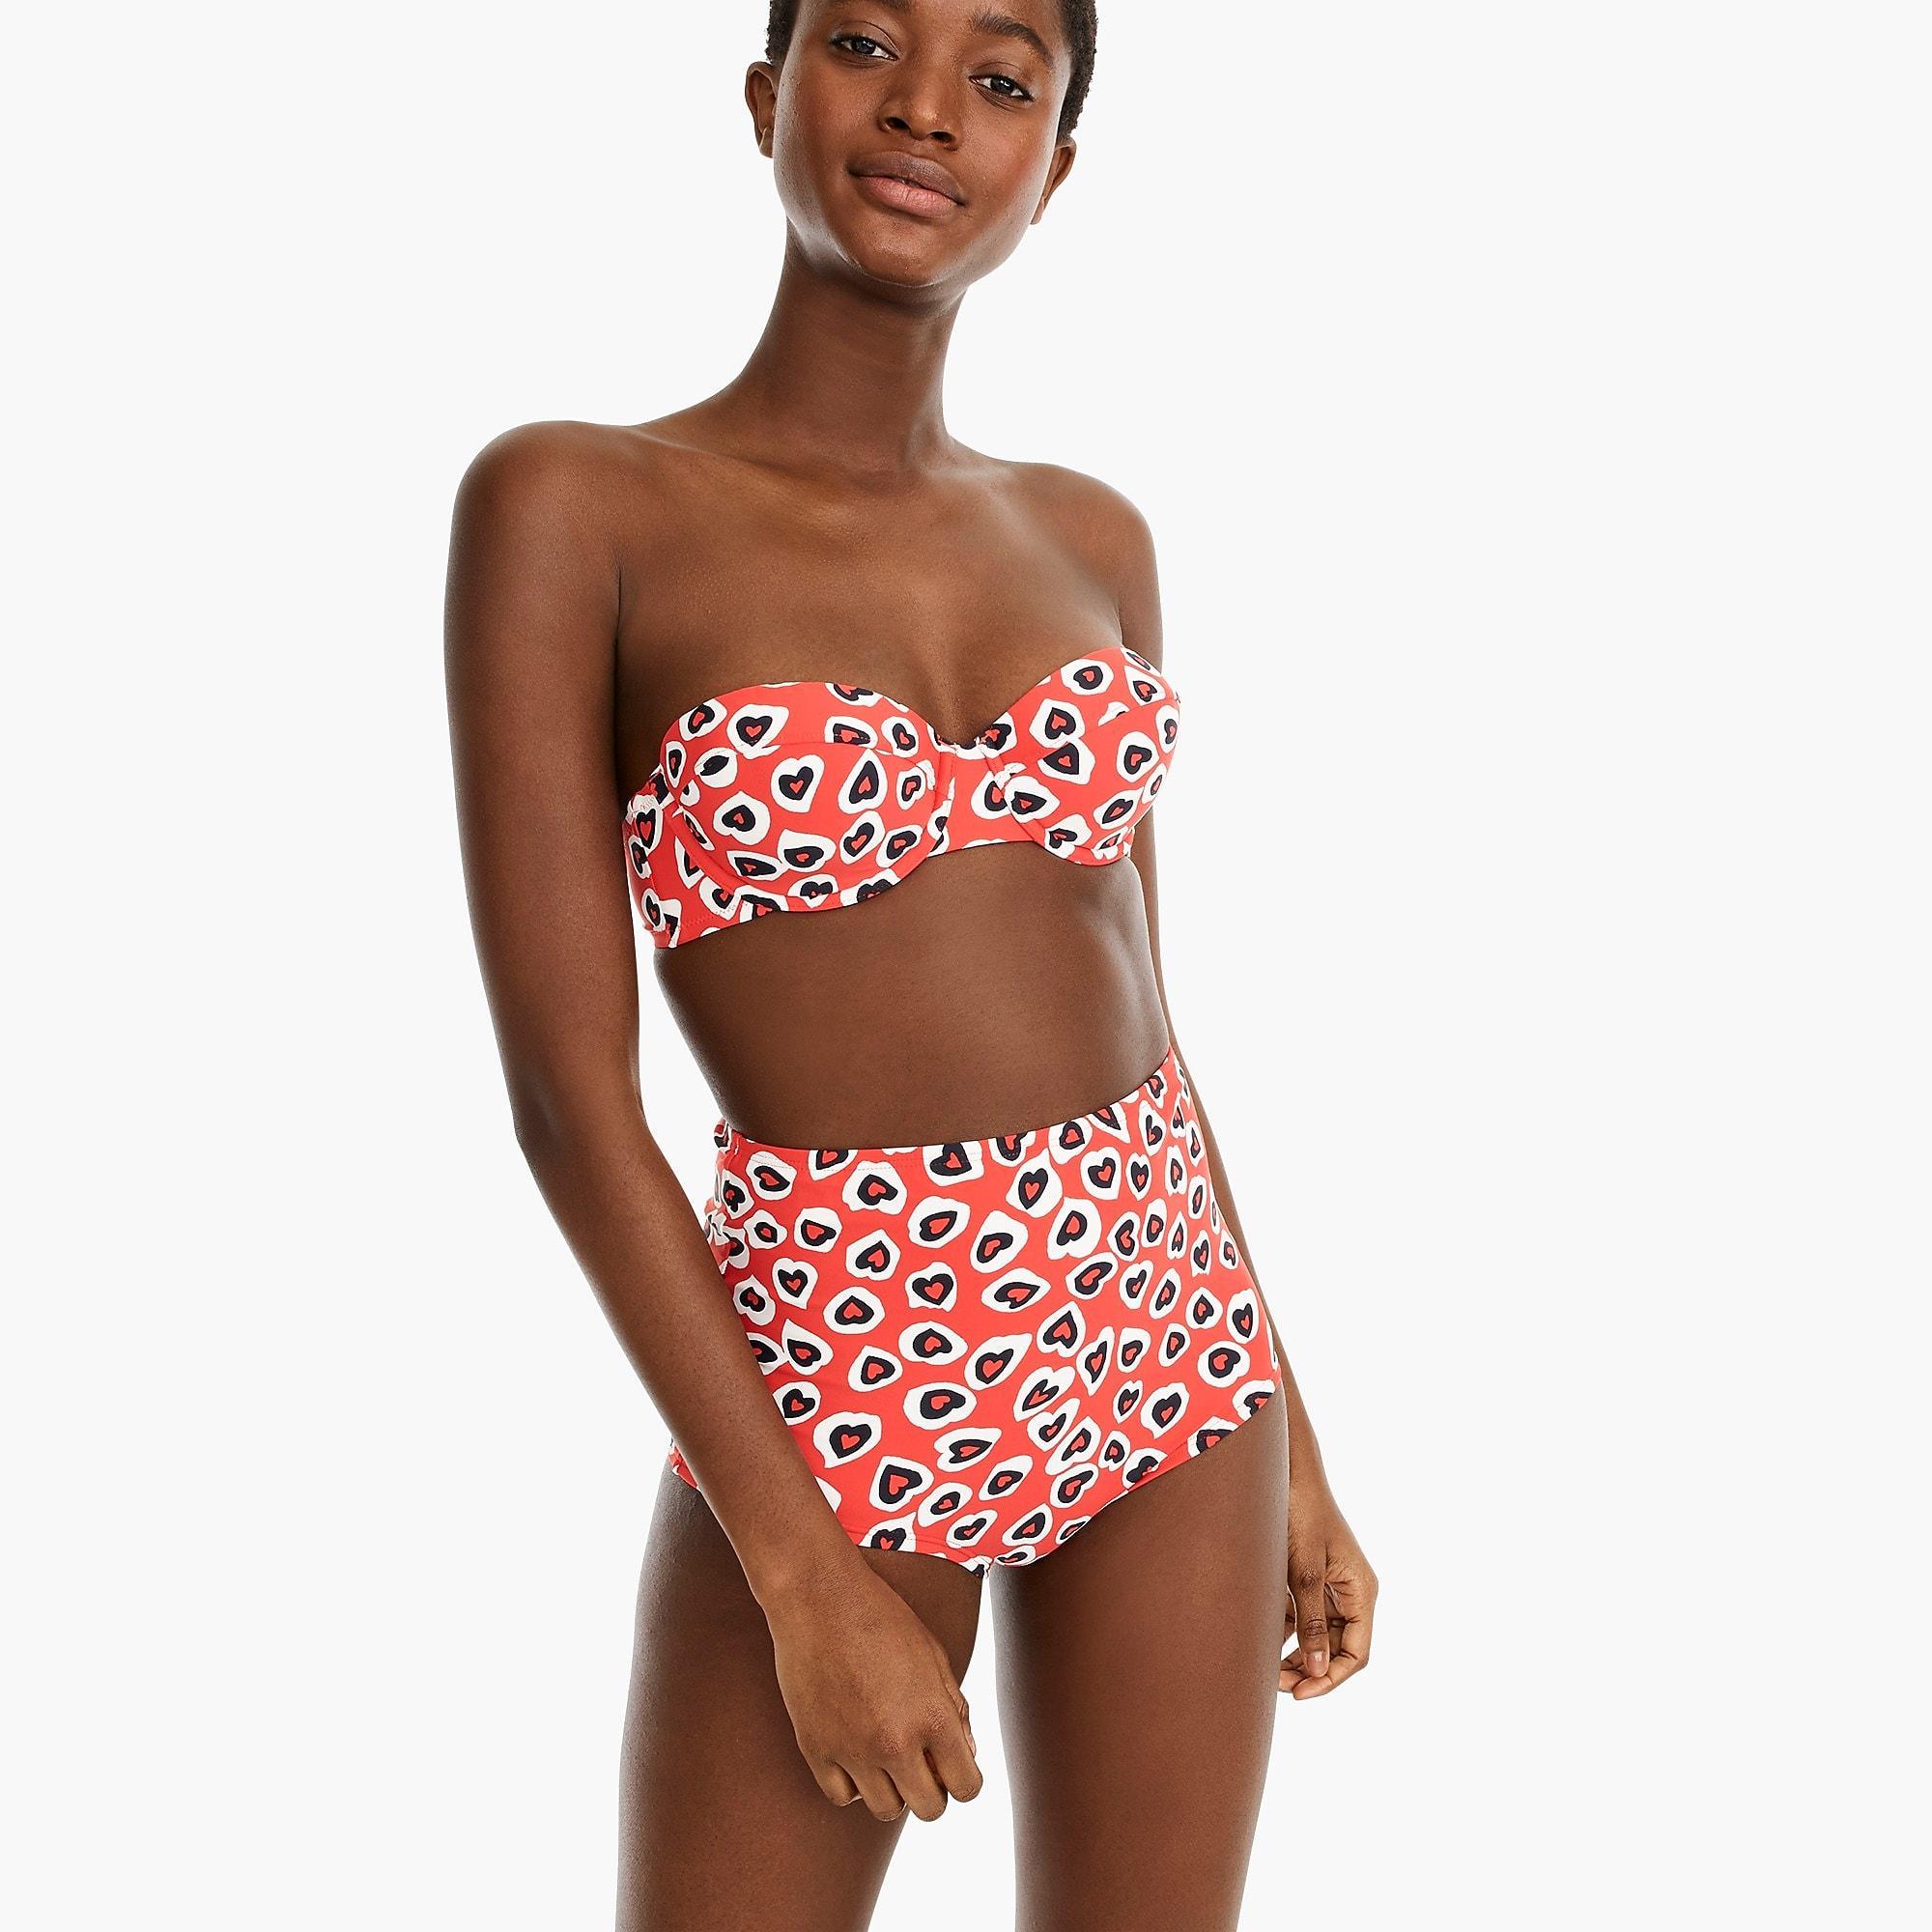 8ccfea2fa0 J.Crew Demi Underwire Bikini Top In Heart Print in Red - Lyst